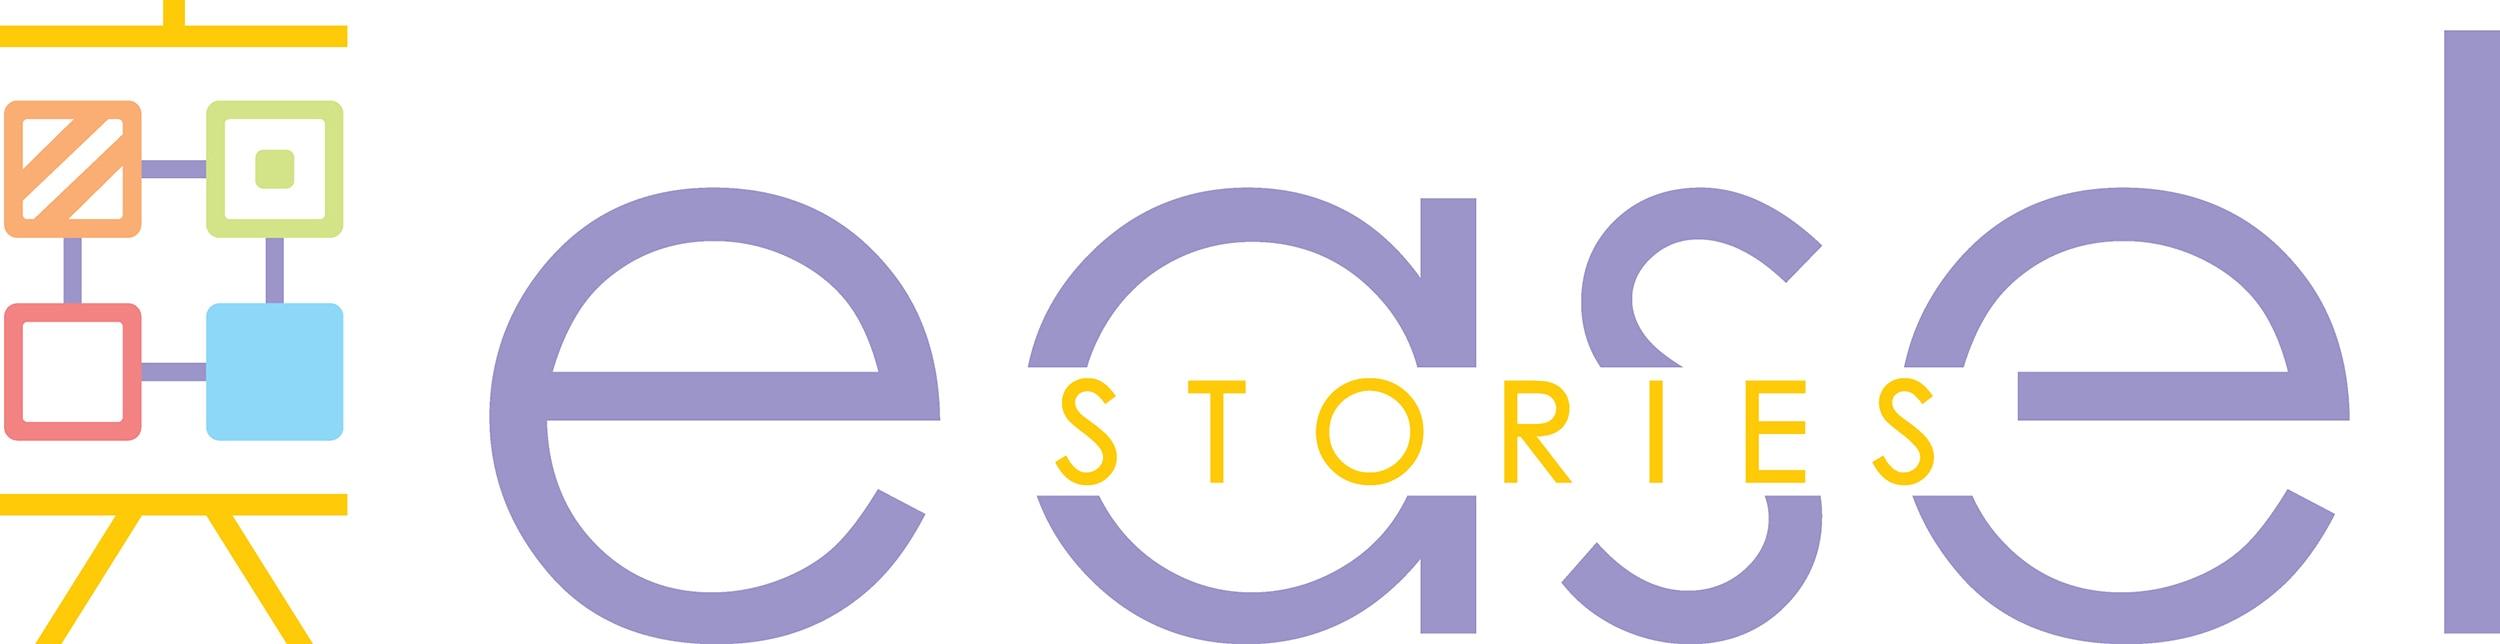 Easel Stories Pvt. Ltd.